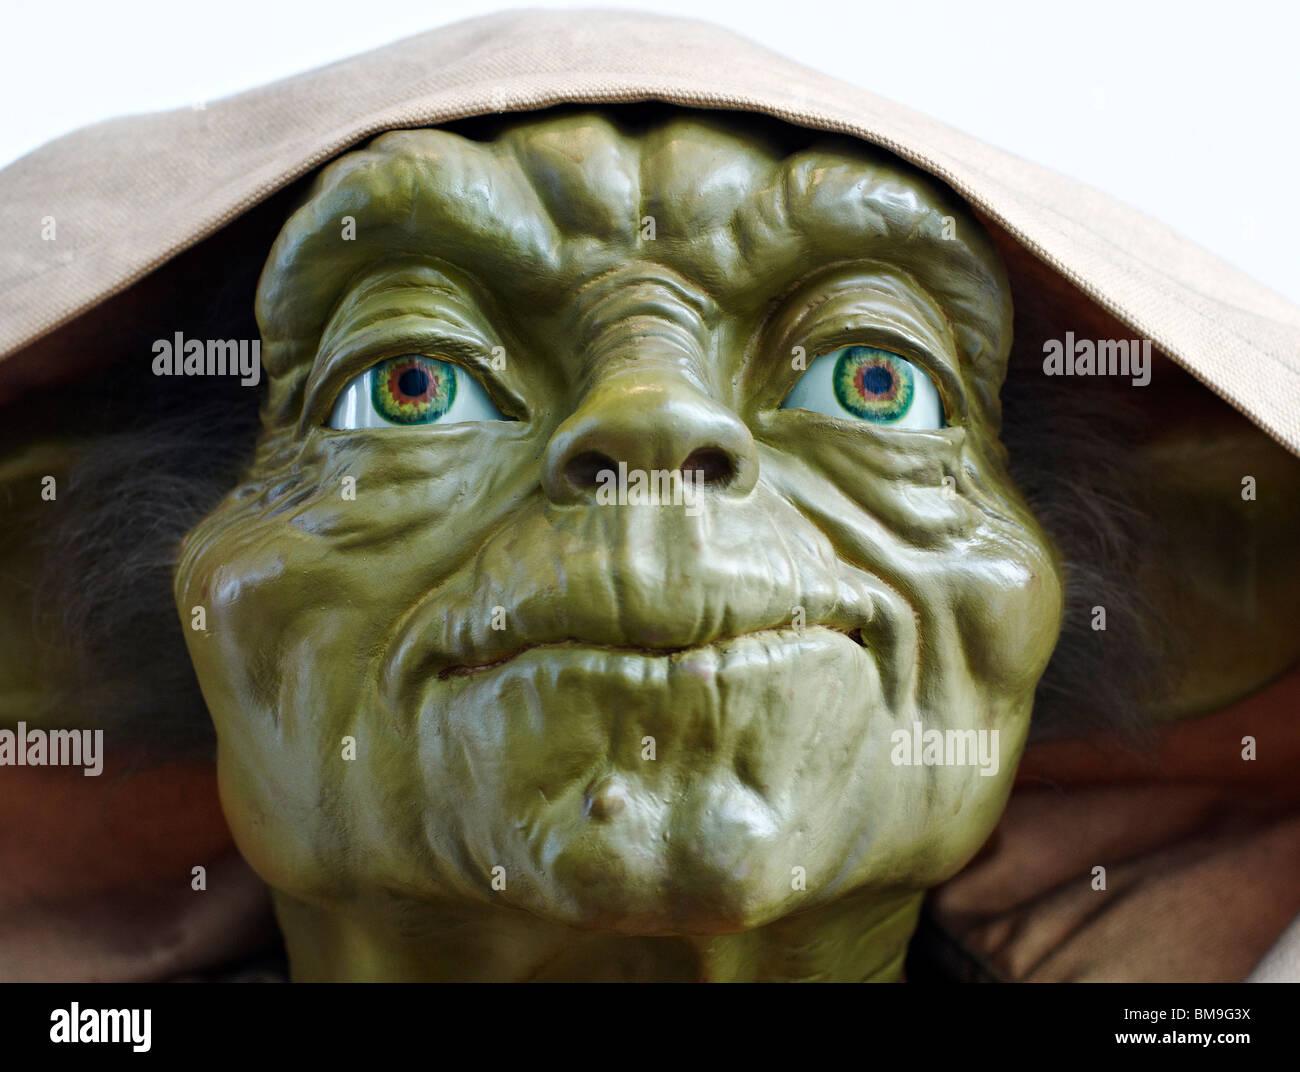 Master Yoda, Star Wars Alien Face Close Up Stock Photo